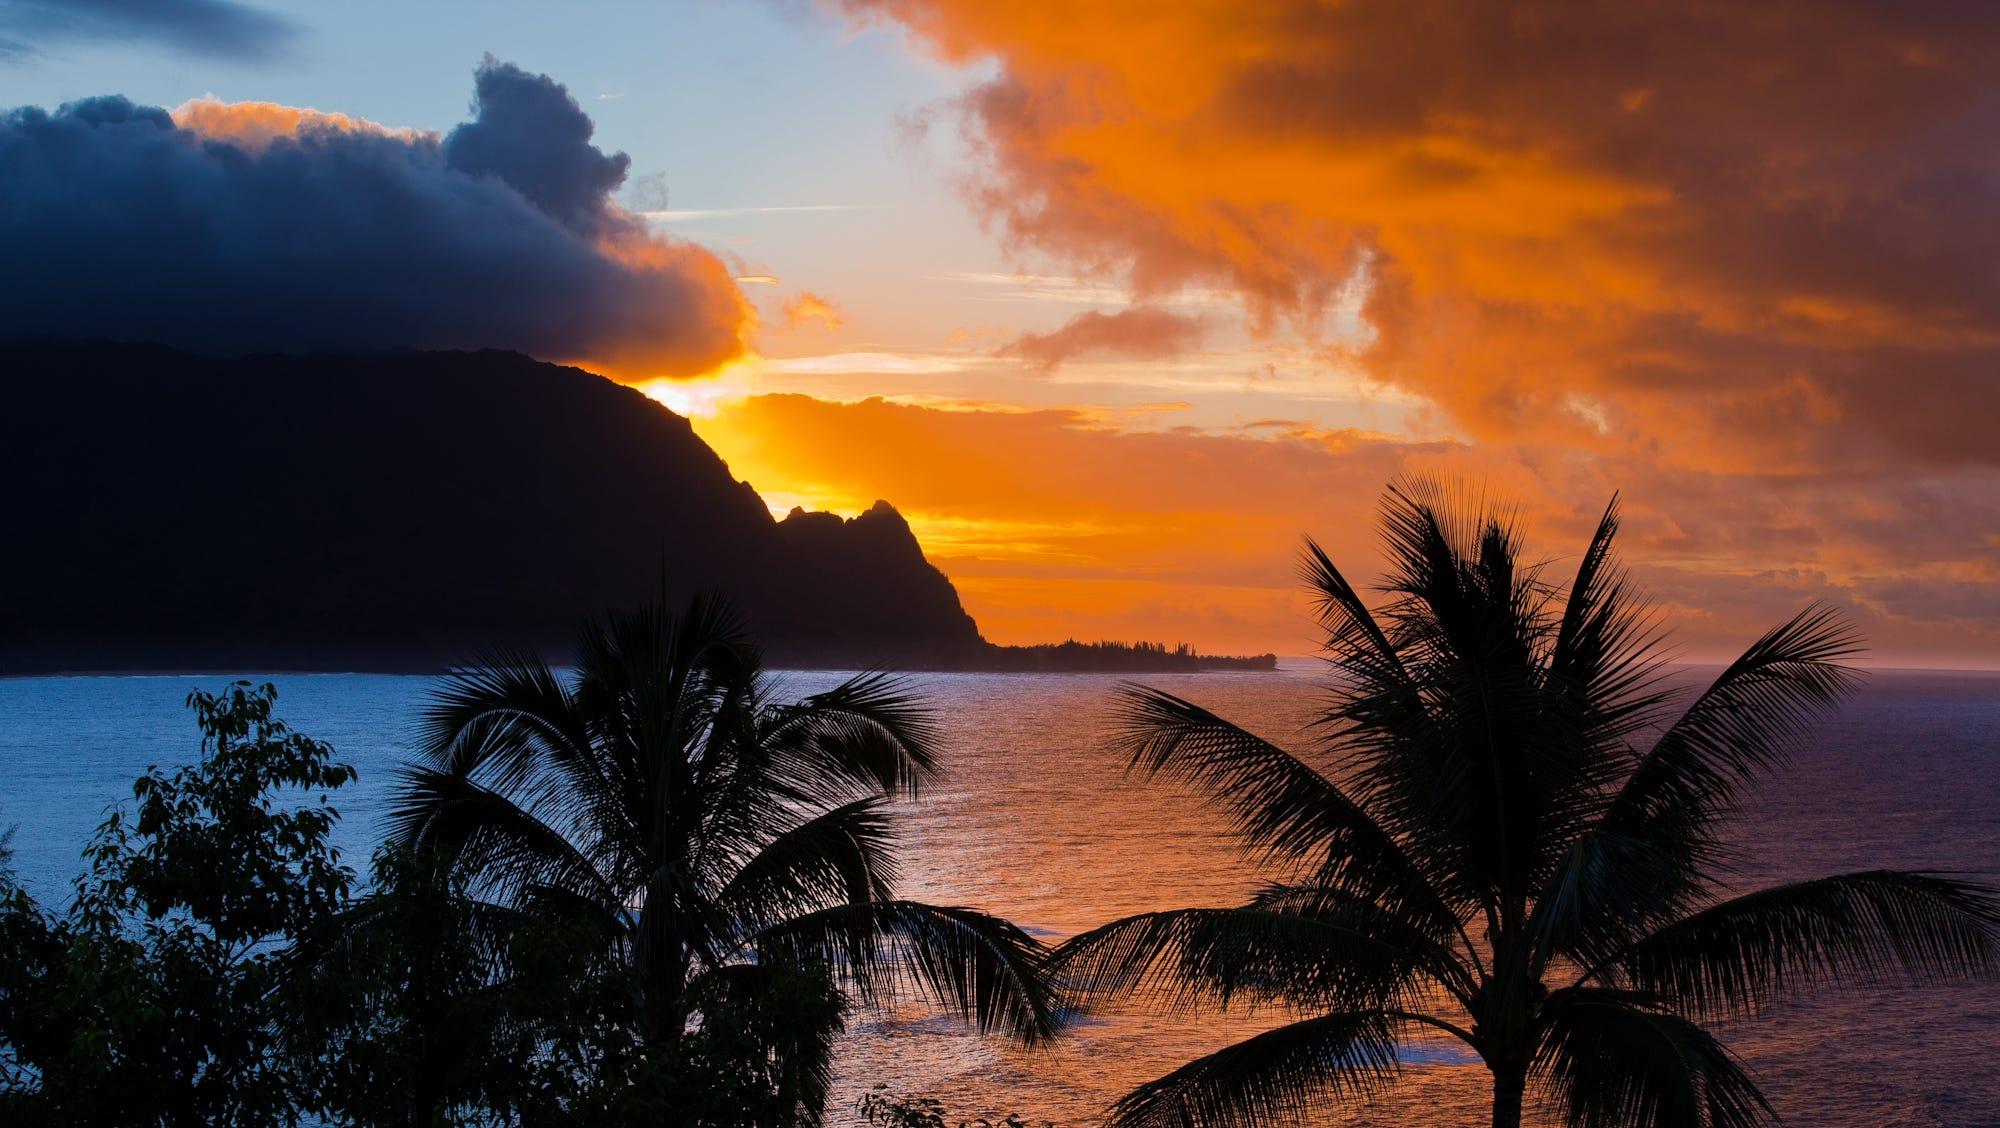 A vivid Kauai sunset illuminates the mountains lining the shore.